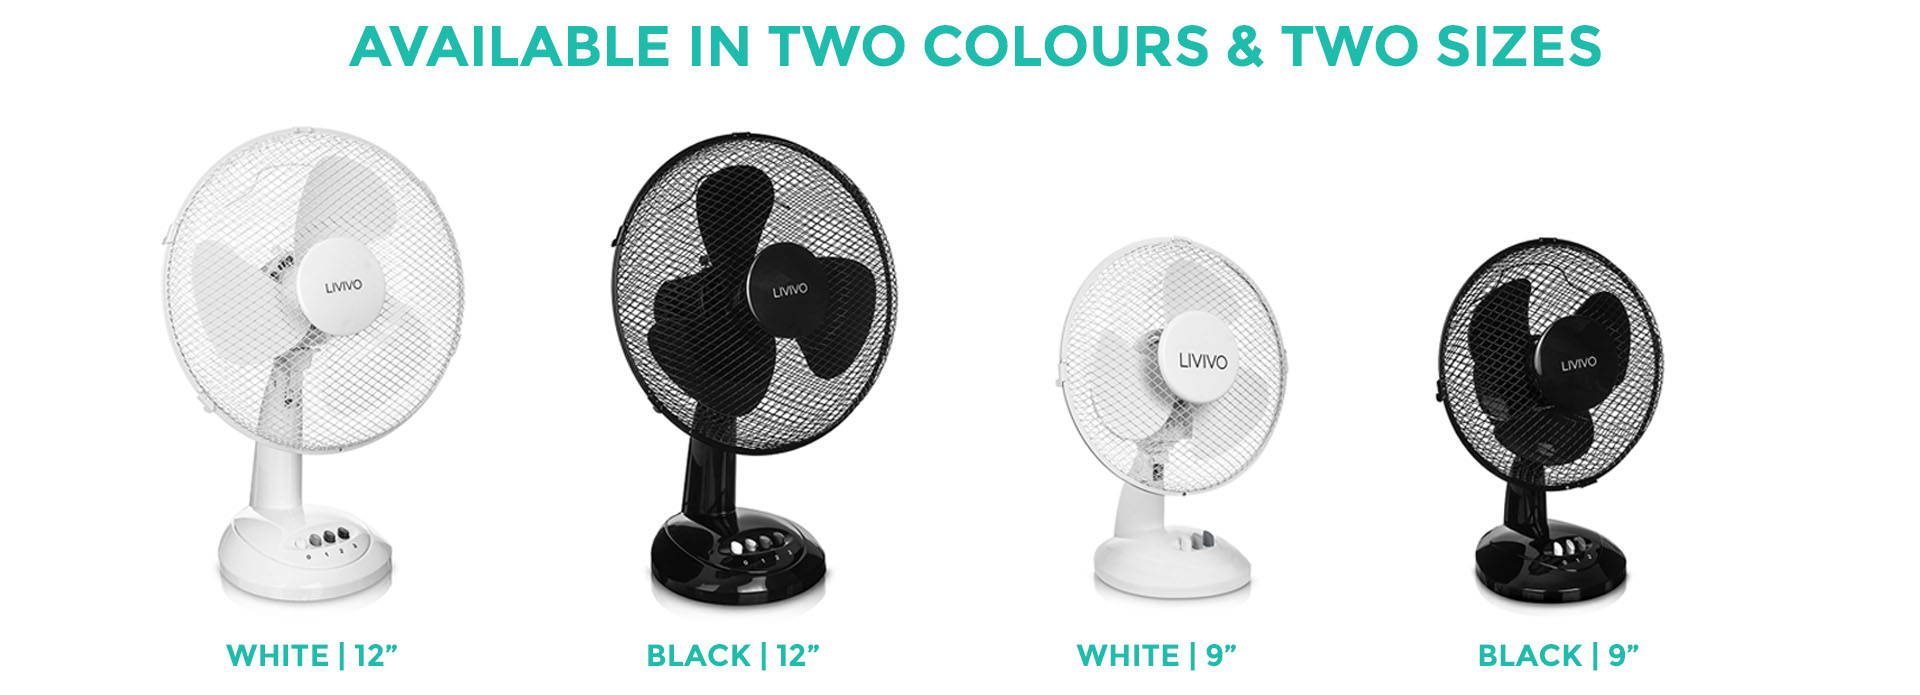 2 Colors & 2 Sizes